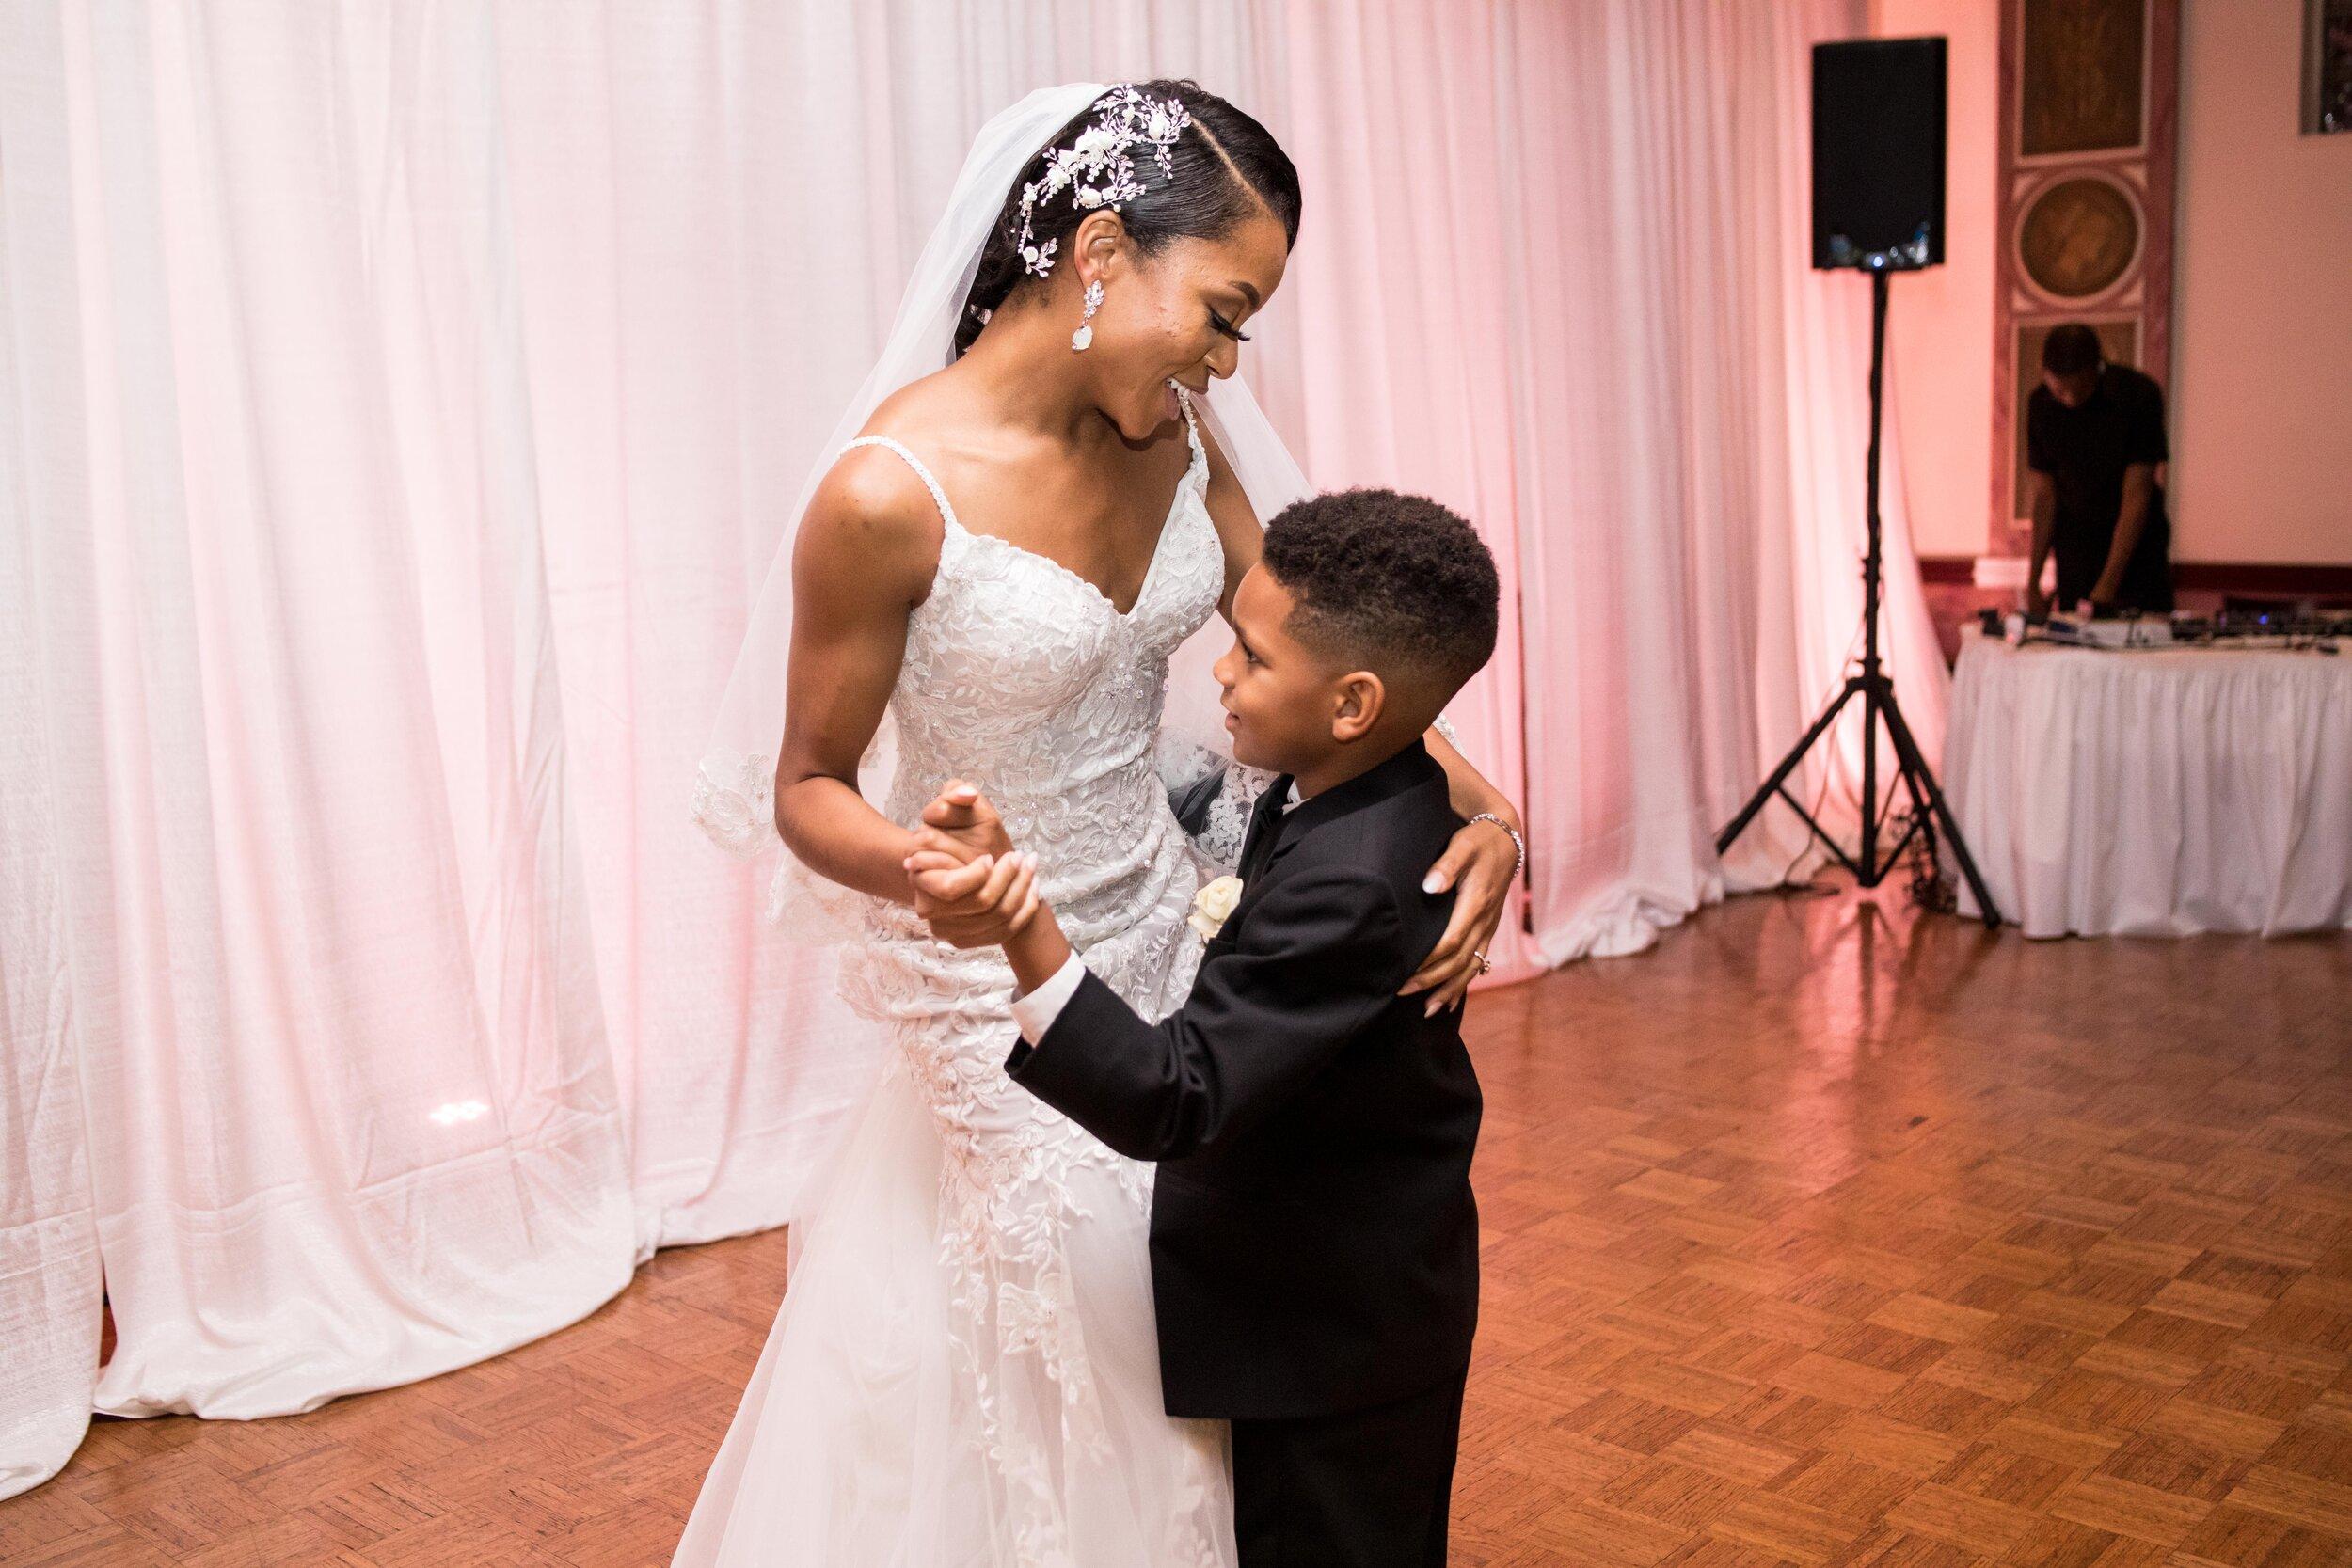 8_3_2019_BONTY_WEDDING-841.jpg